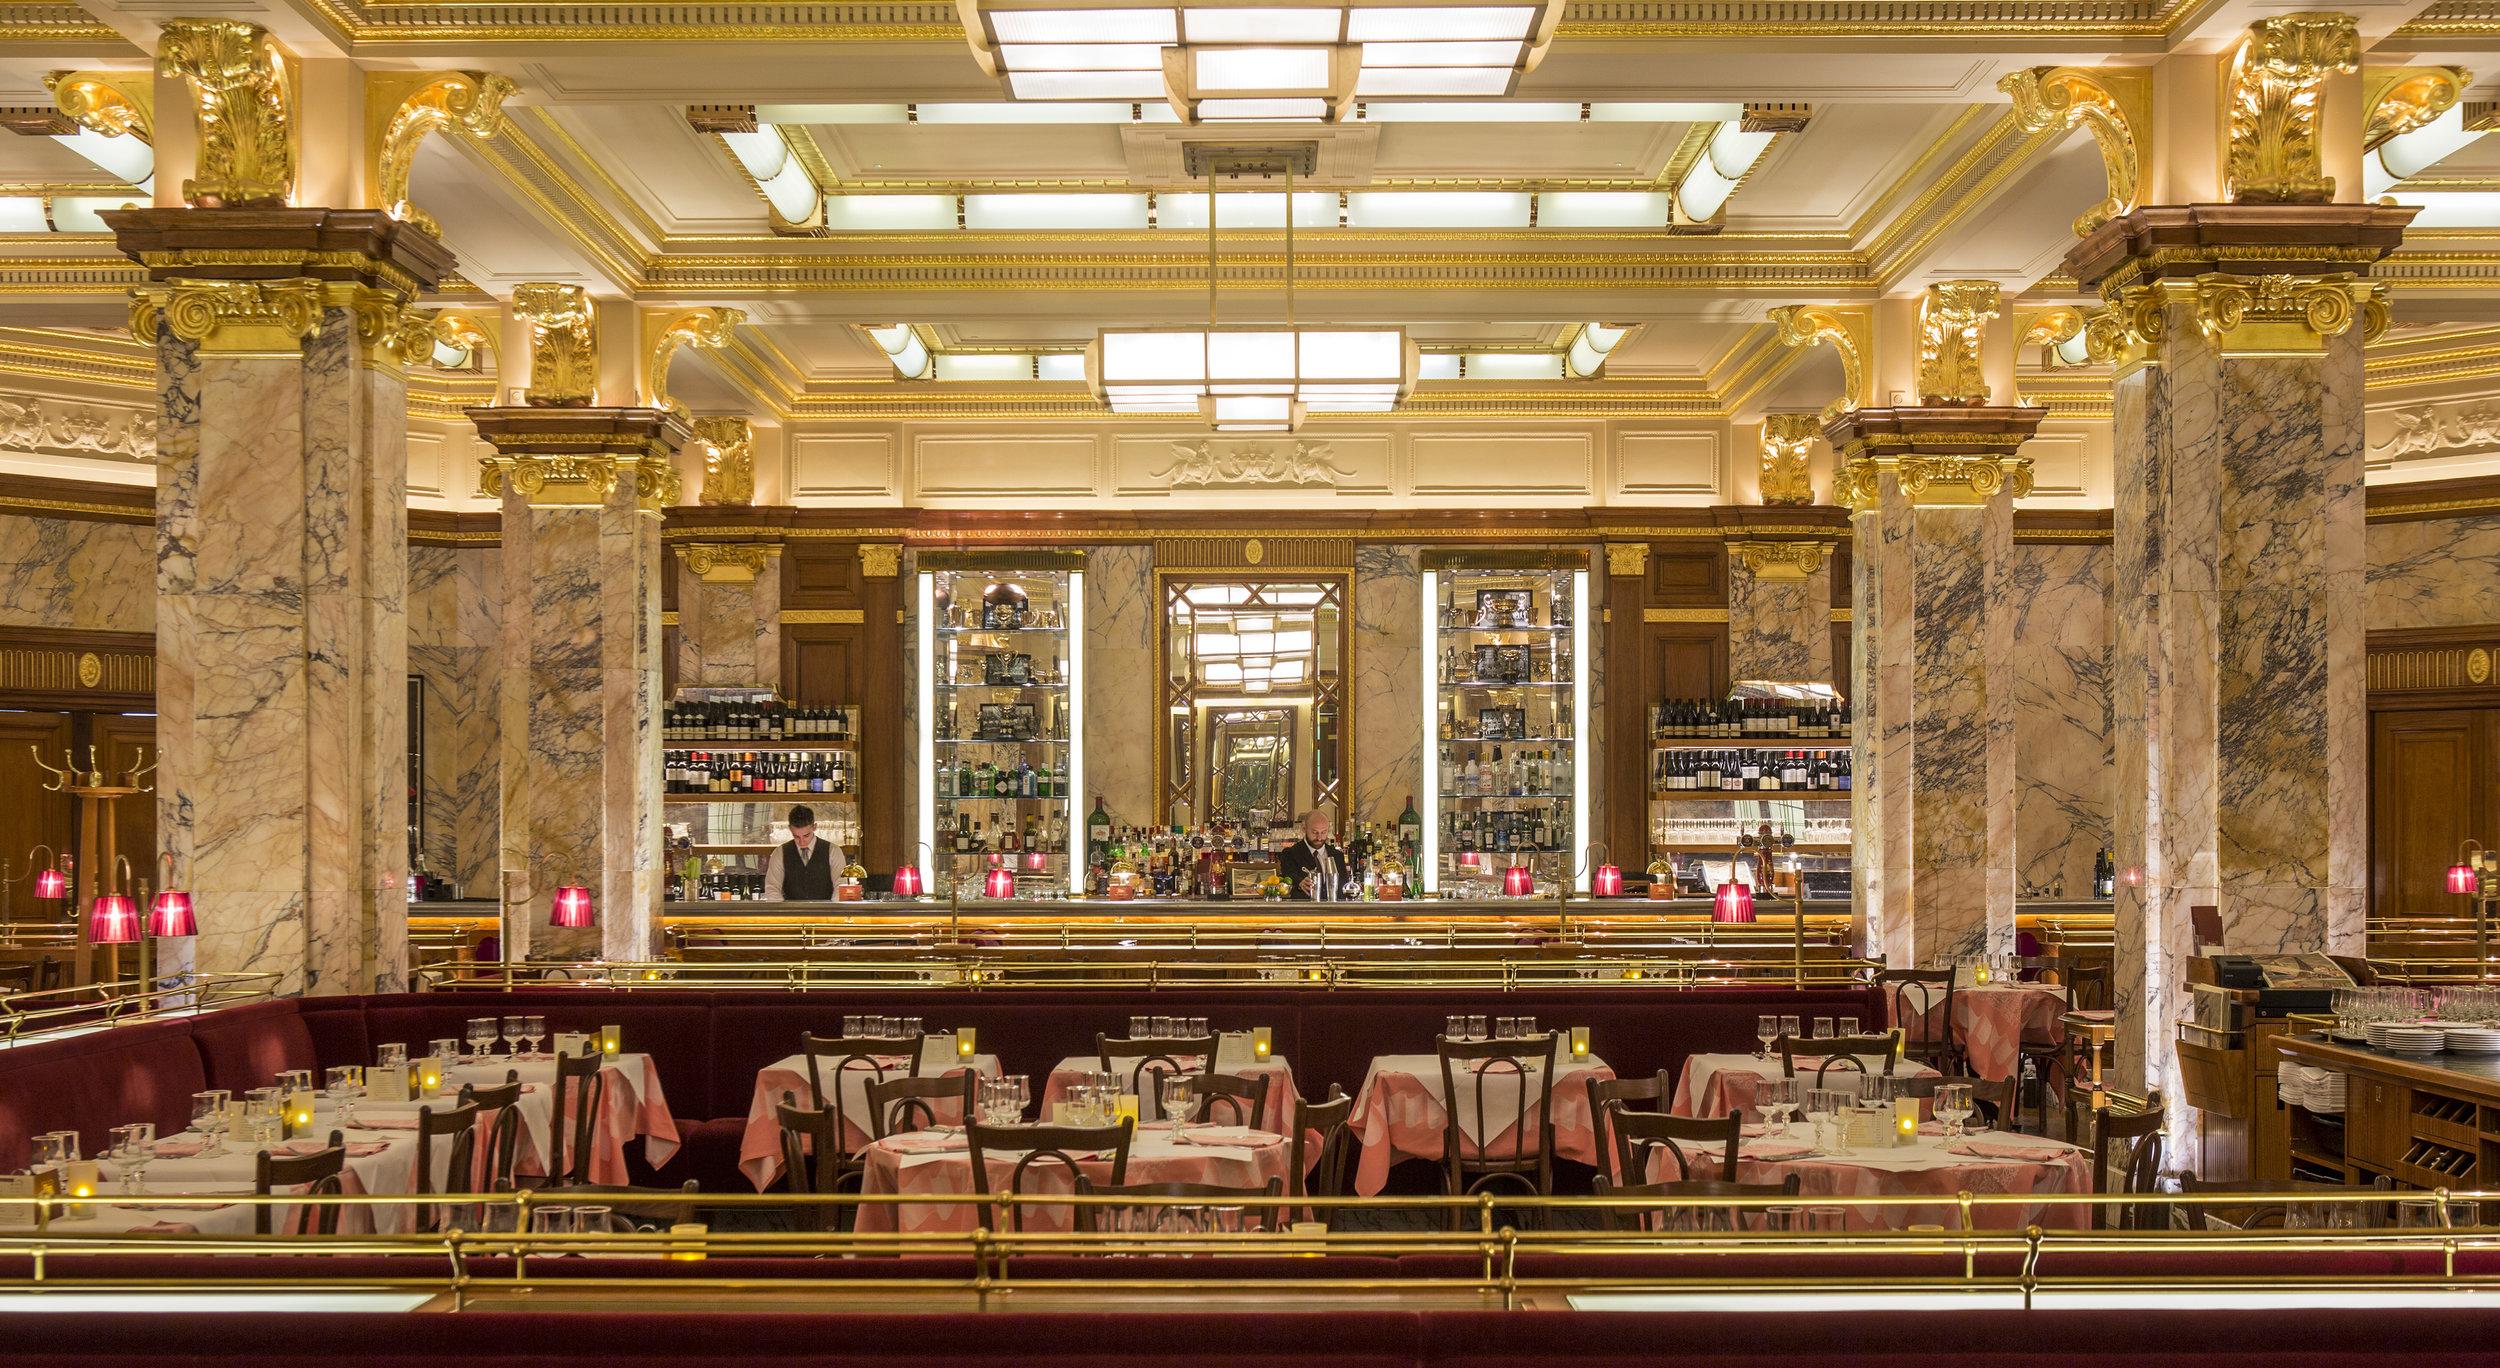 Brasserie Zedel_interior_4.jpg